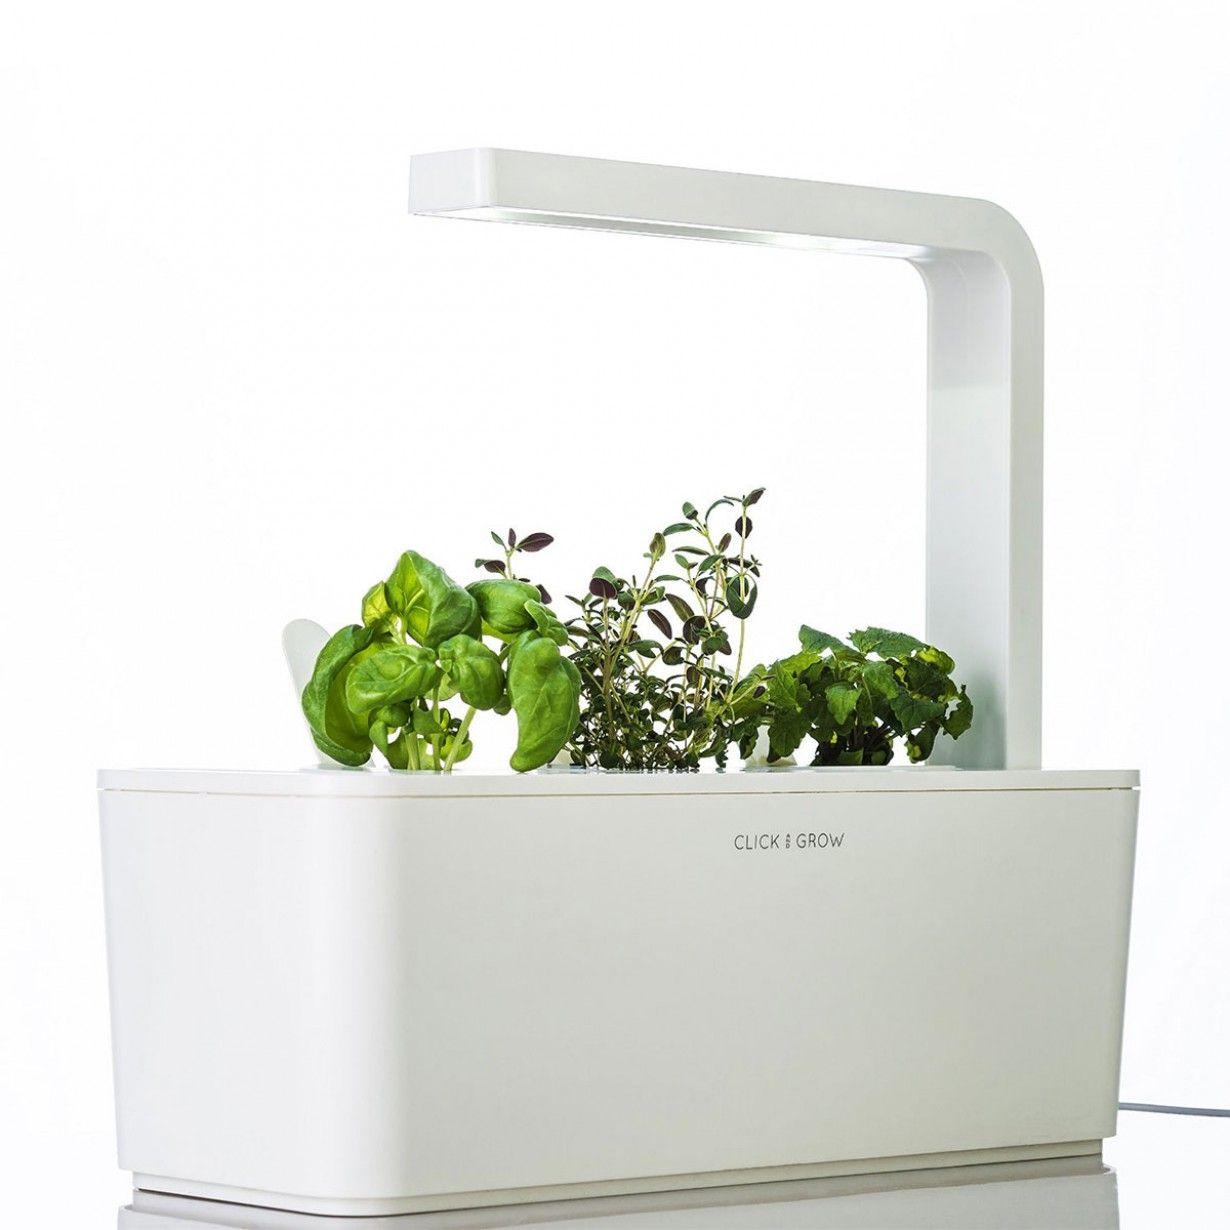 Click Grow Smarter Kräutergarten Für Drinnen 3 400 x 300